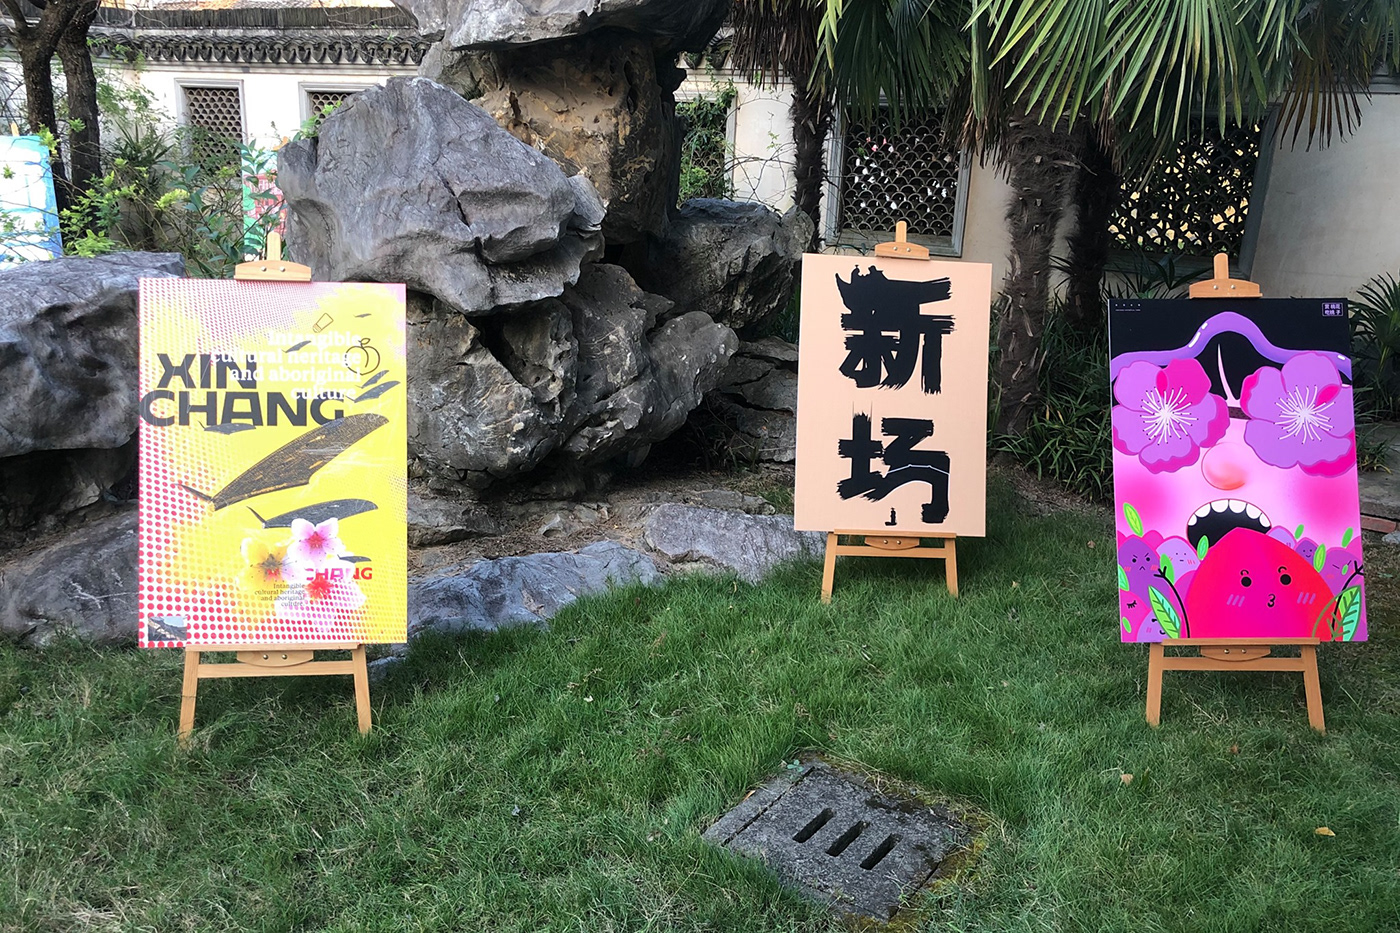 design Francesco Mazzenga graphic design  historical town poster exhibition Xinchang